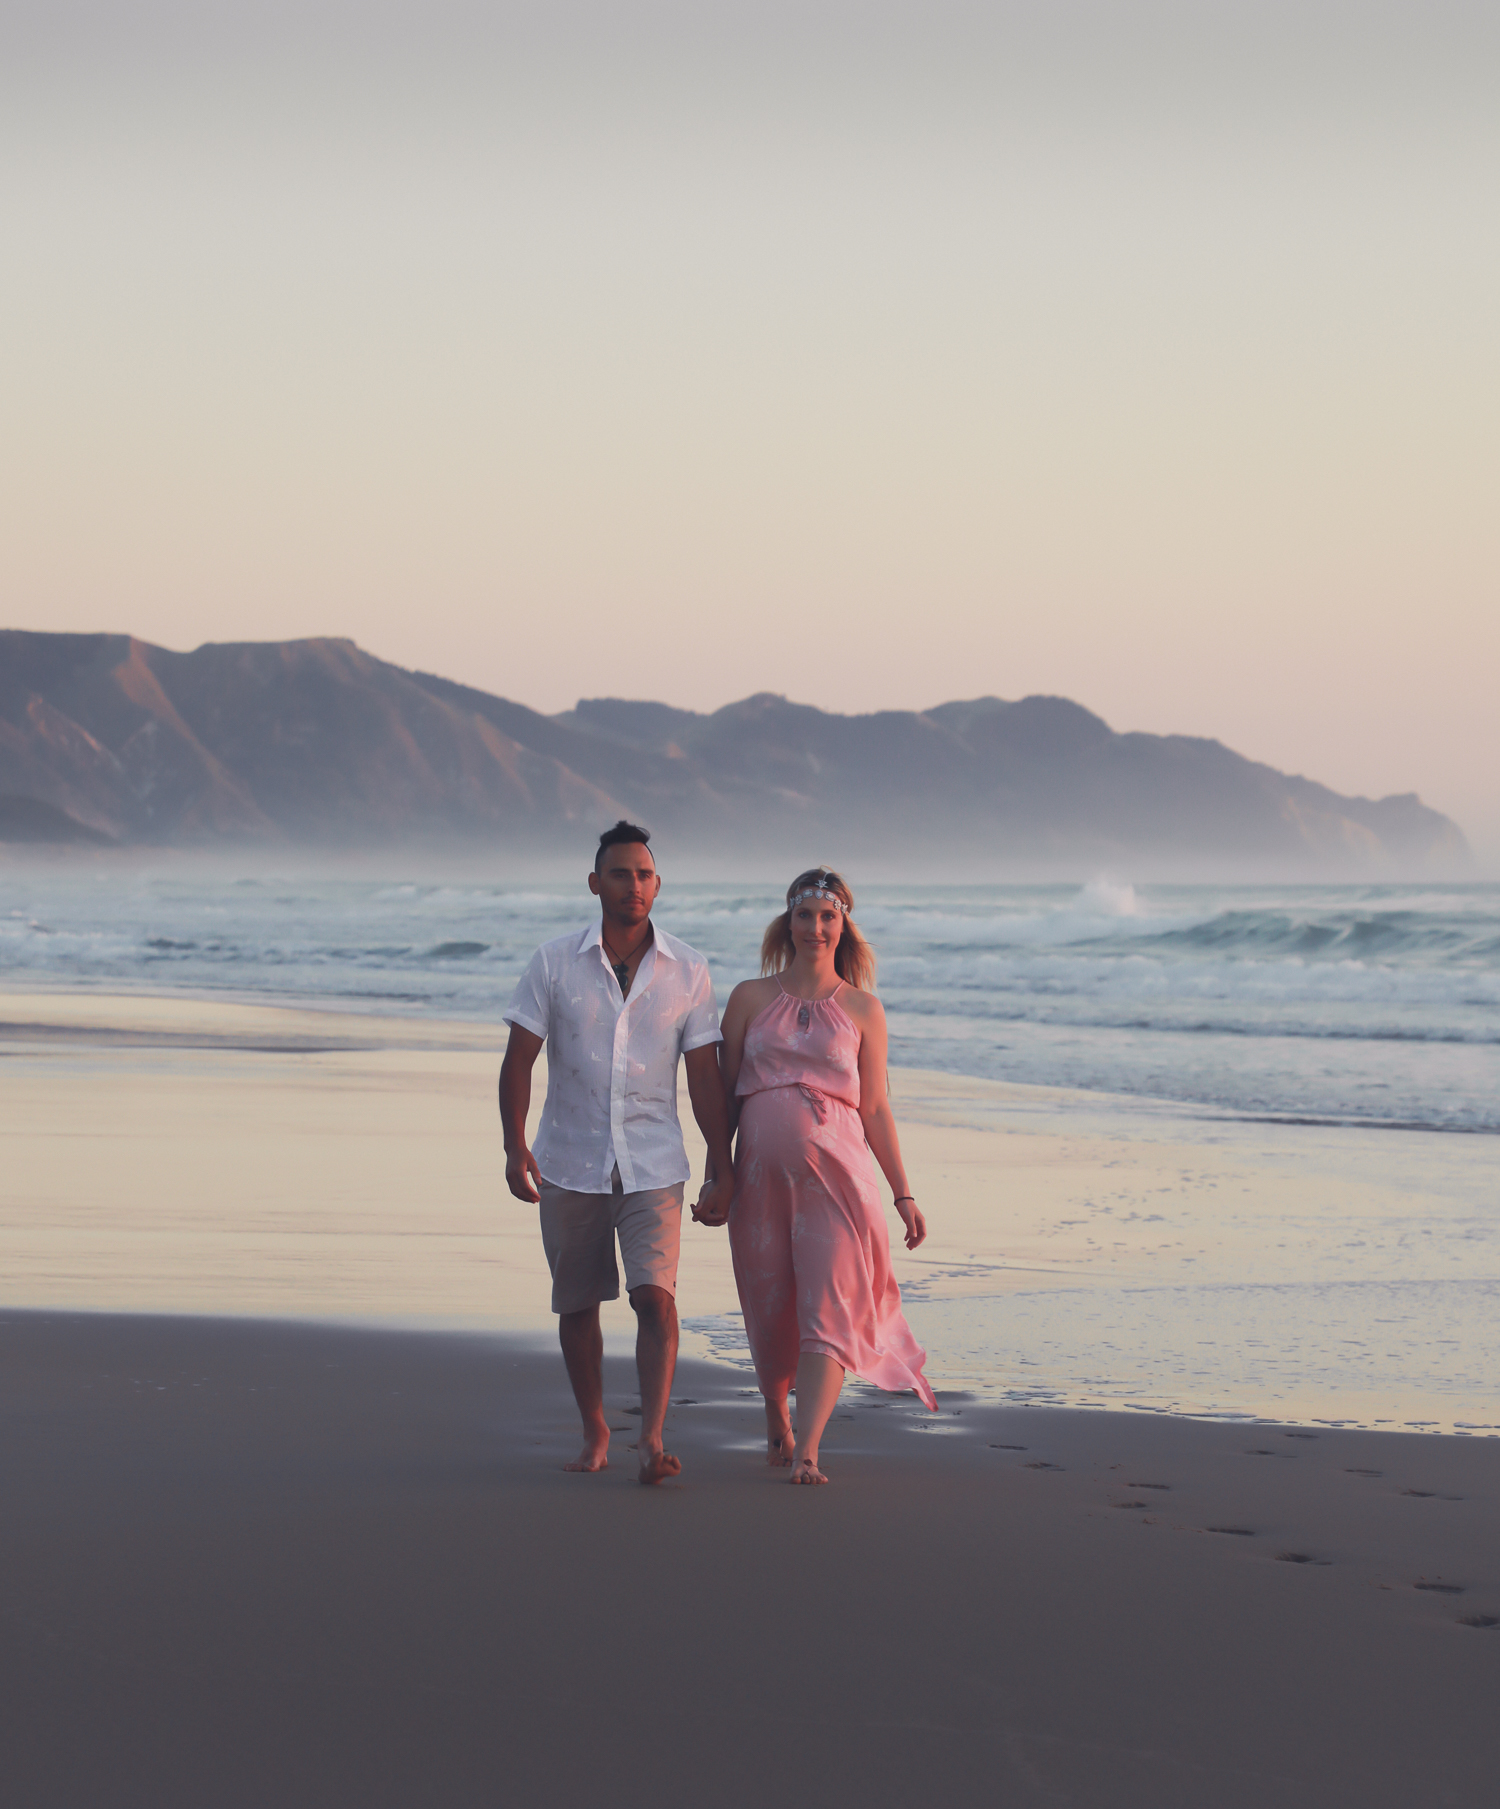 pregnant woman at beach at sunrise with husband walking along beach